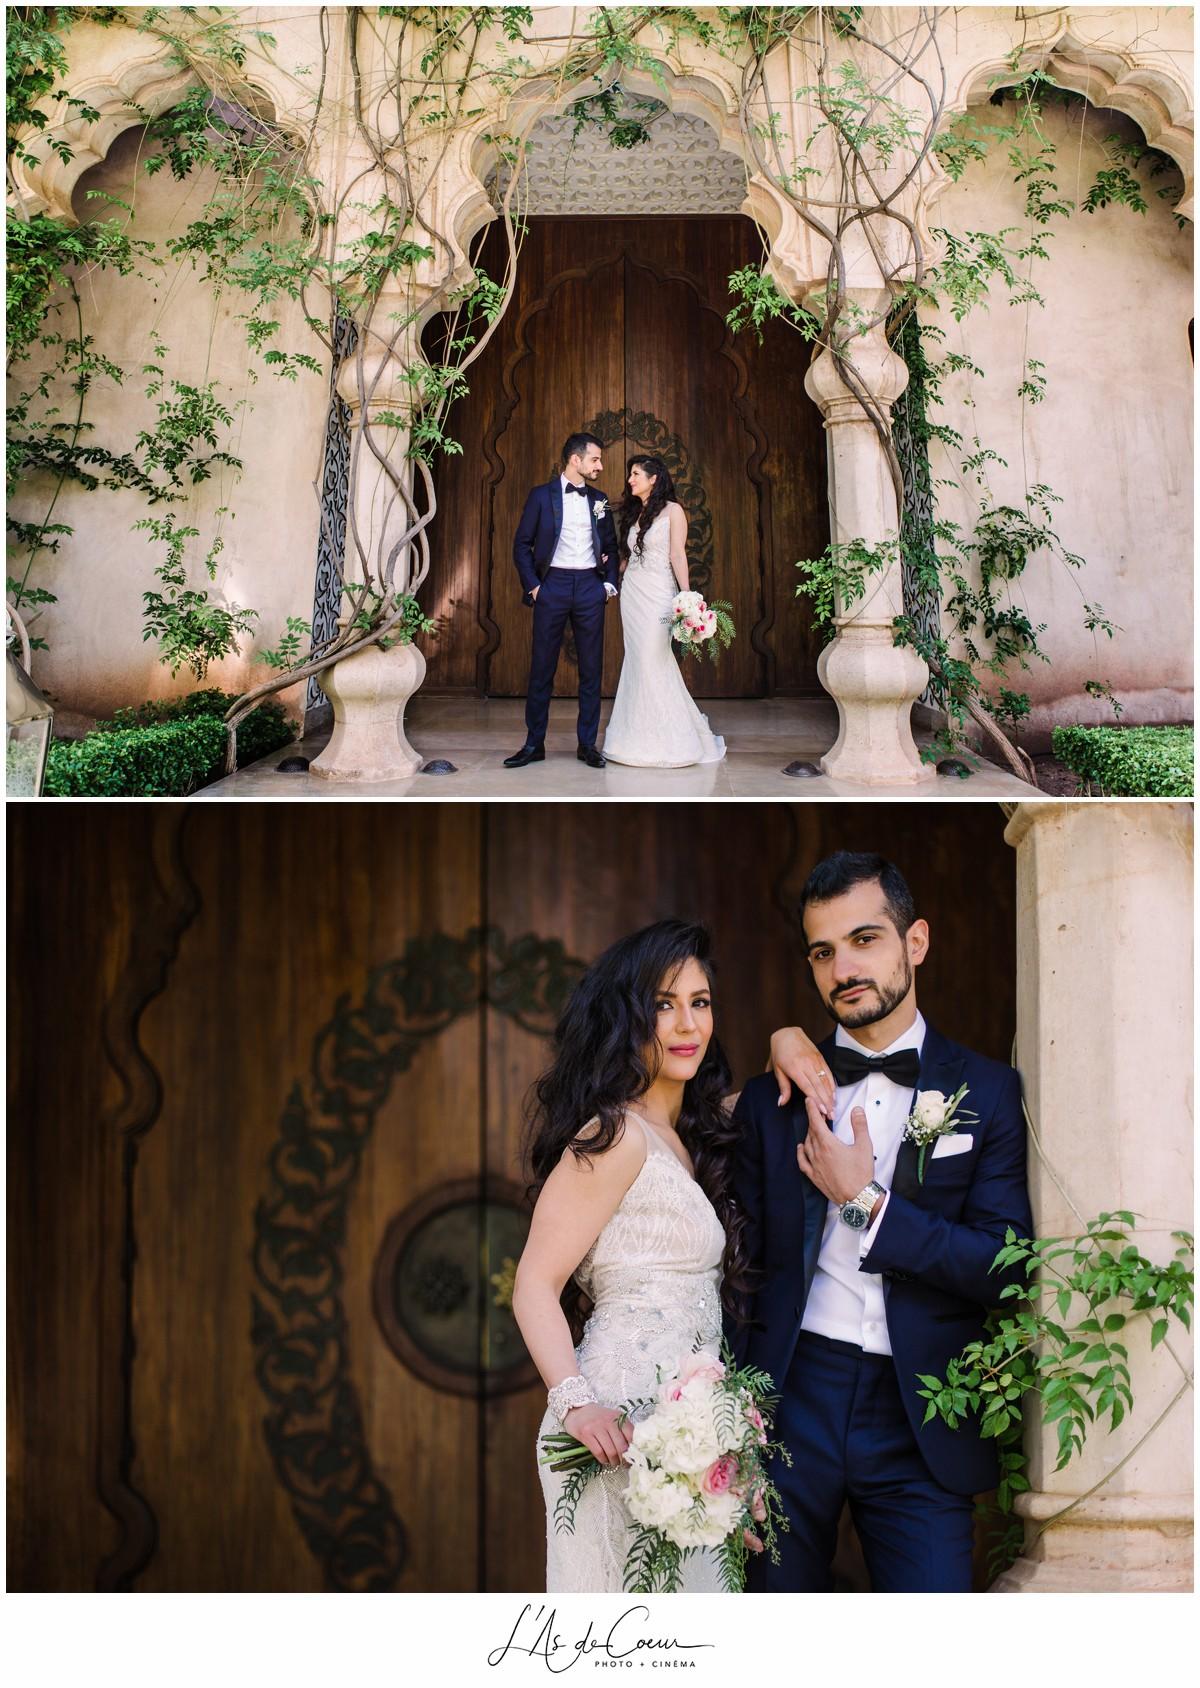 Photographe mariage Marrakech Palais Namaskar Maroc 1